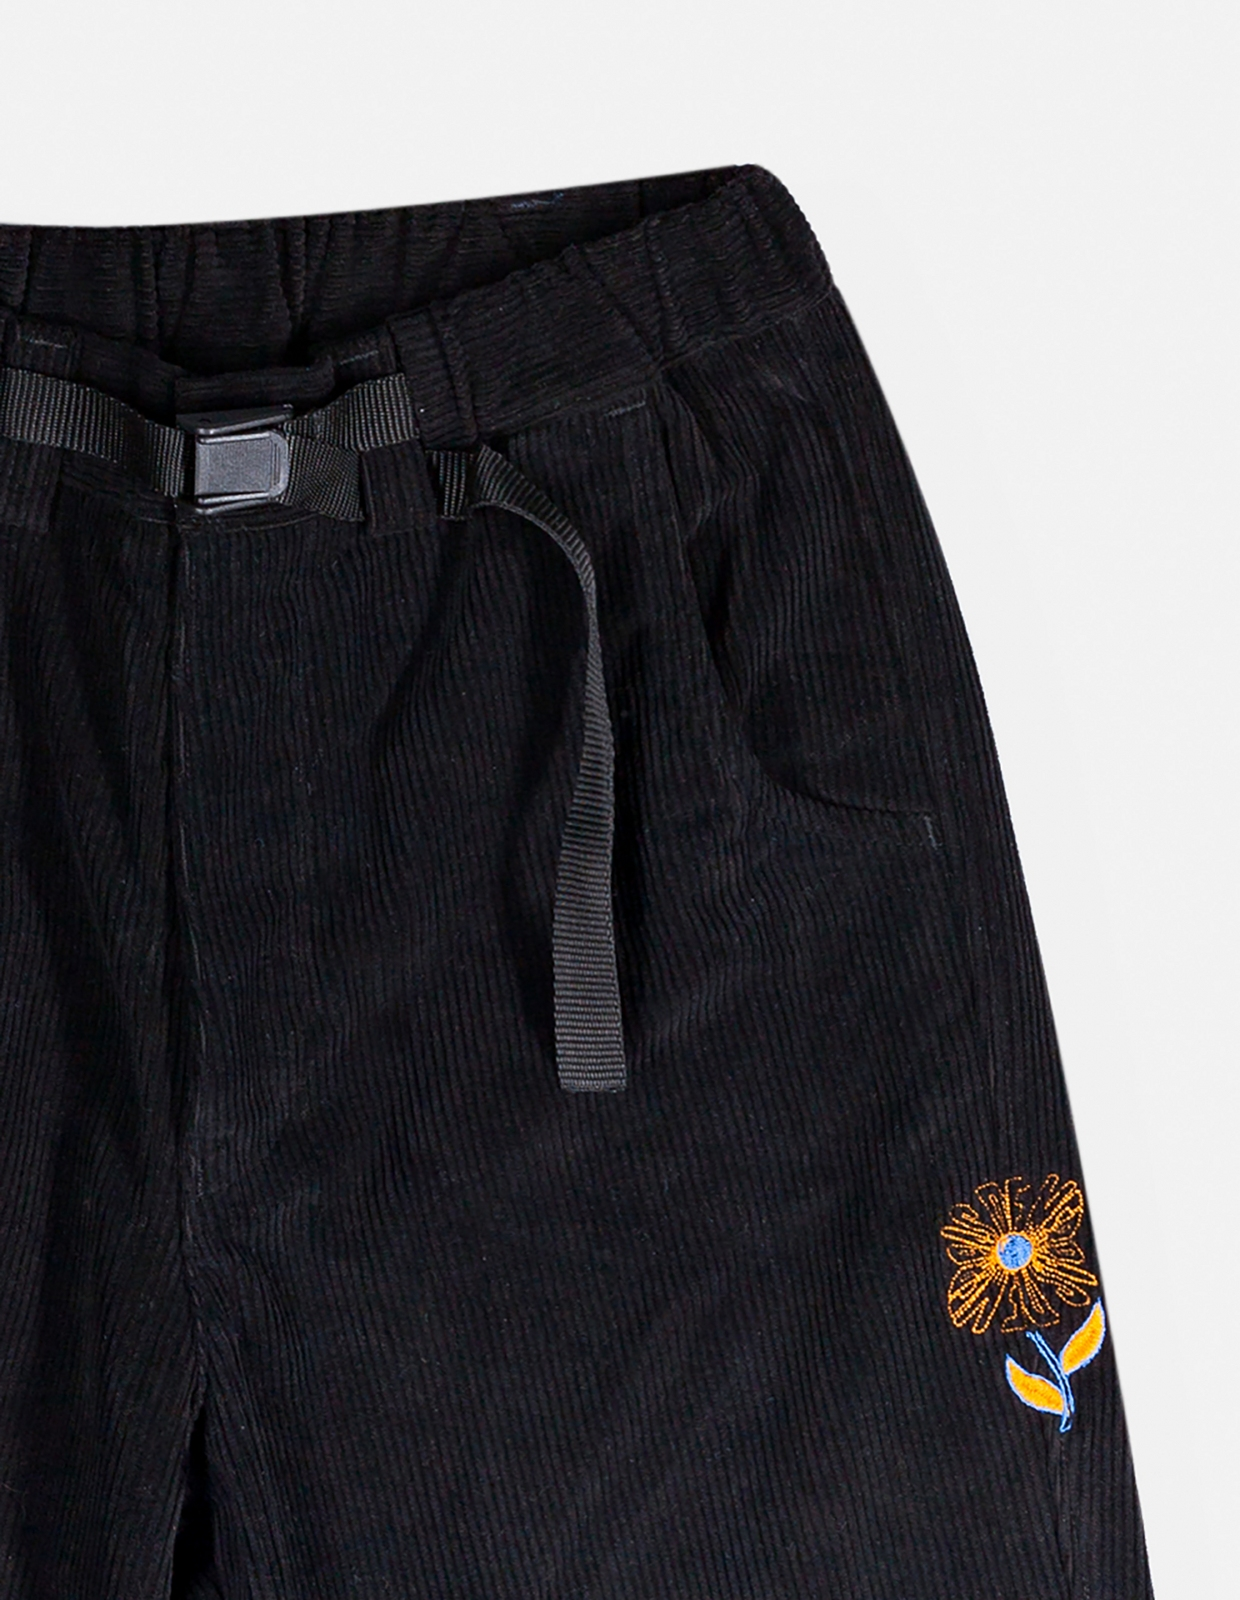 【PAS DE MER/パドゥメ】WRONG PLACE PANTS パンツ / BLACK